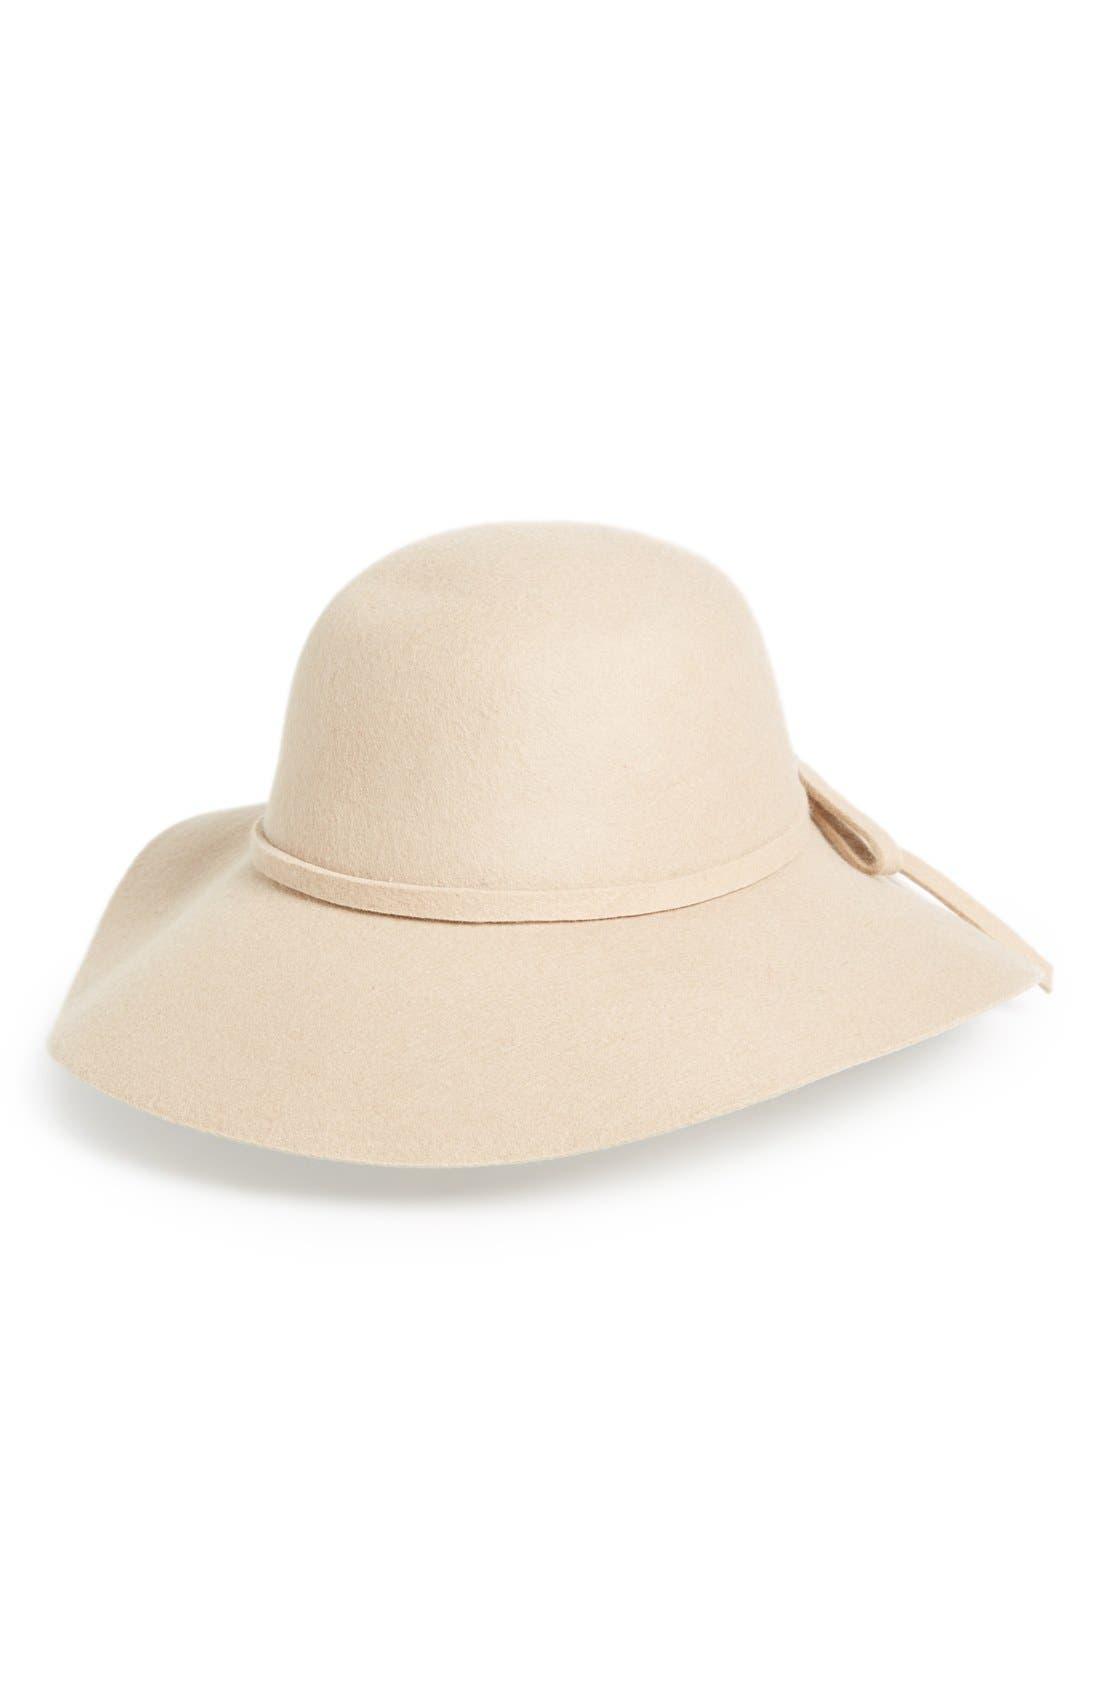 Main Image - Emanuel GeraldoWool Felt Floppy Hat